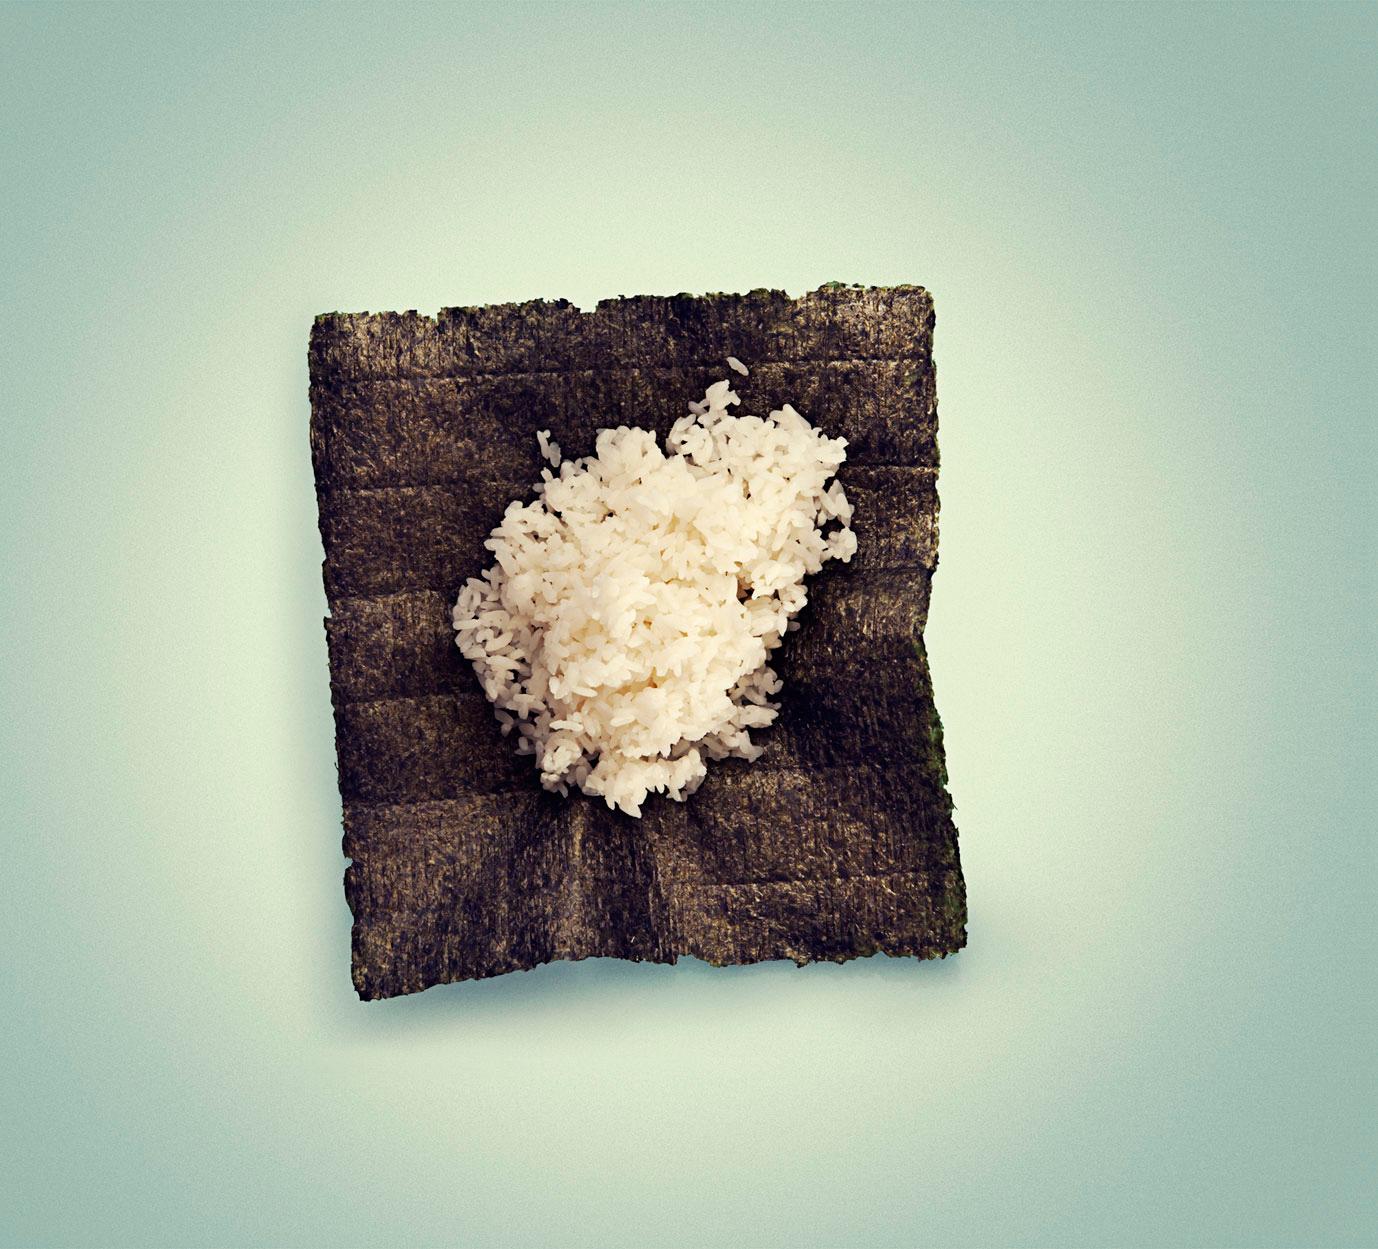 Seaweed-with-rice1.jpg